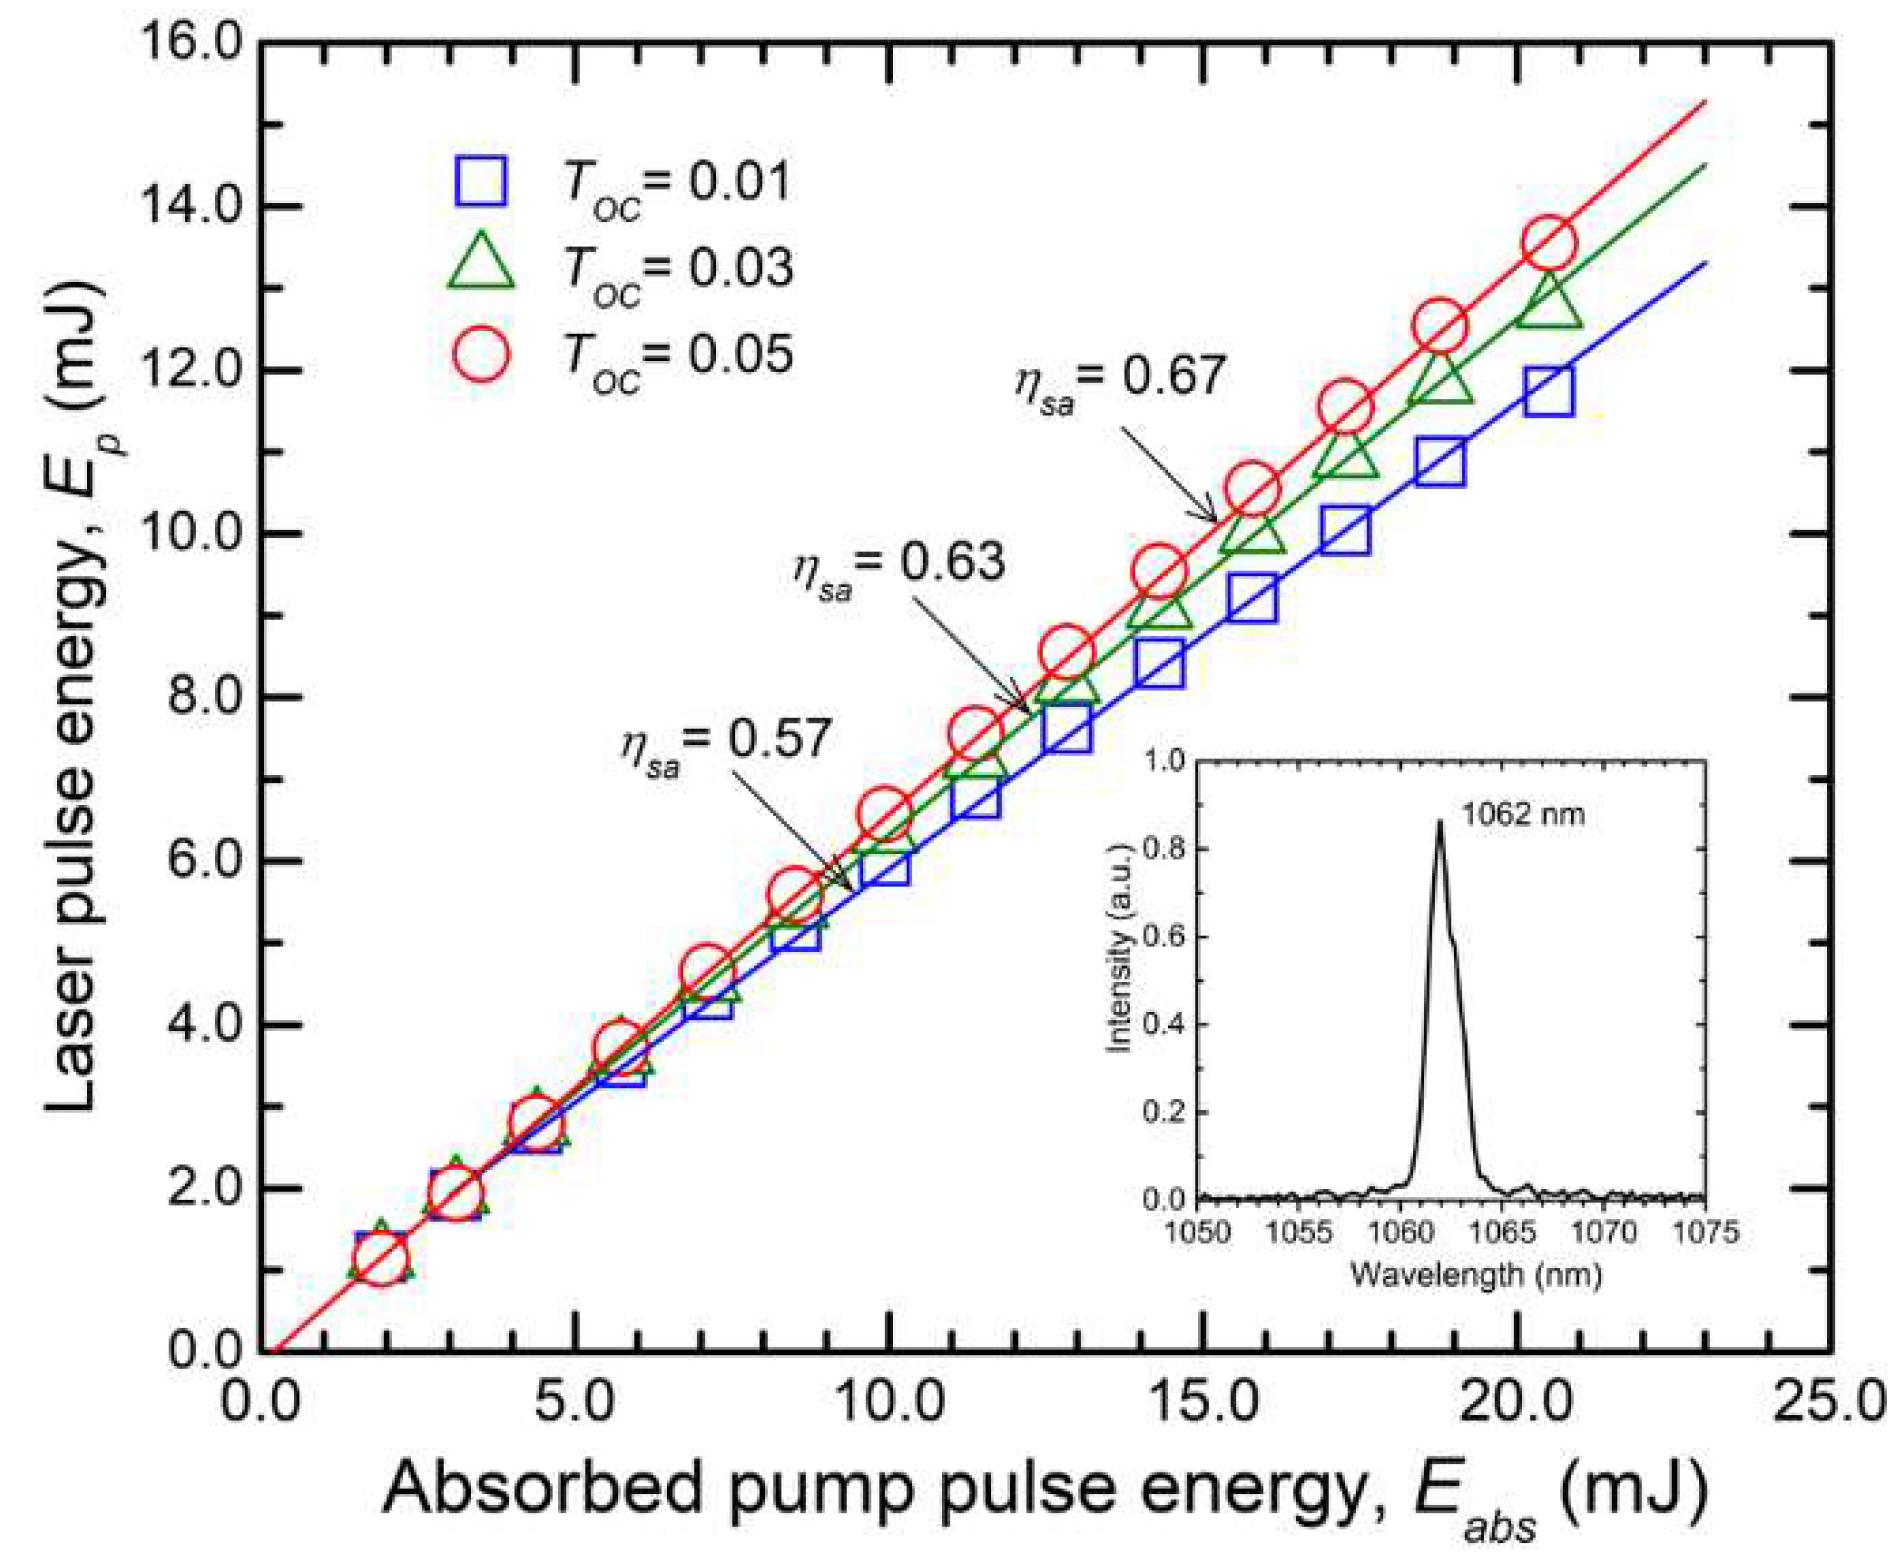 Materials | Free Full-Text | Efficient 1 µm Laser Emission